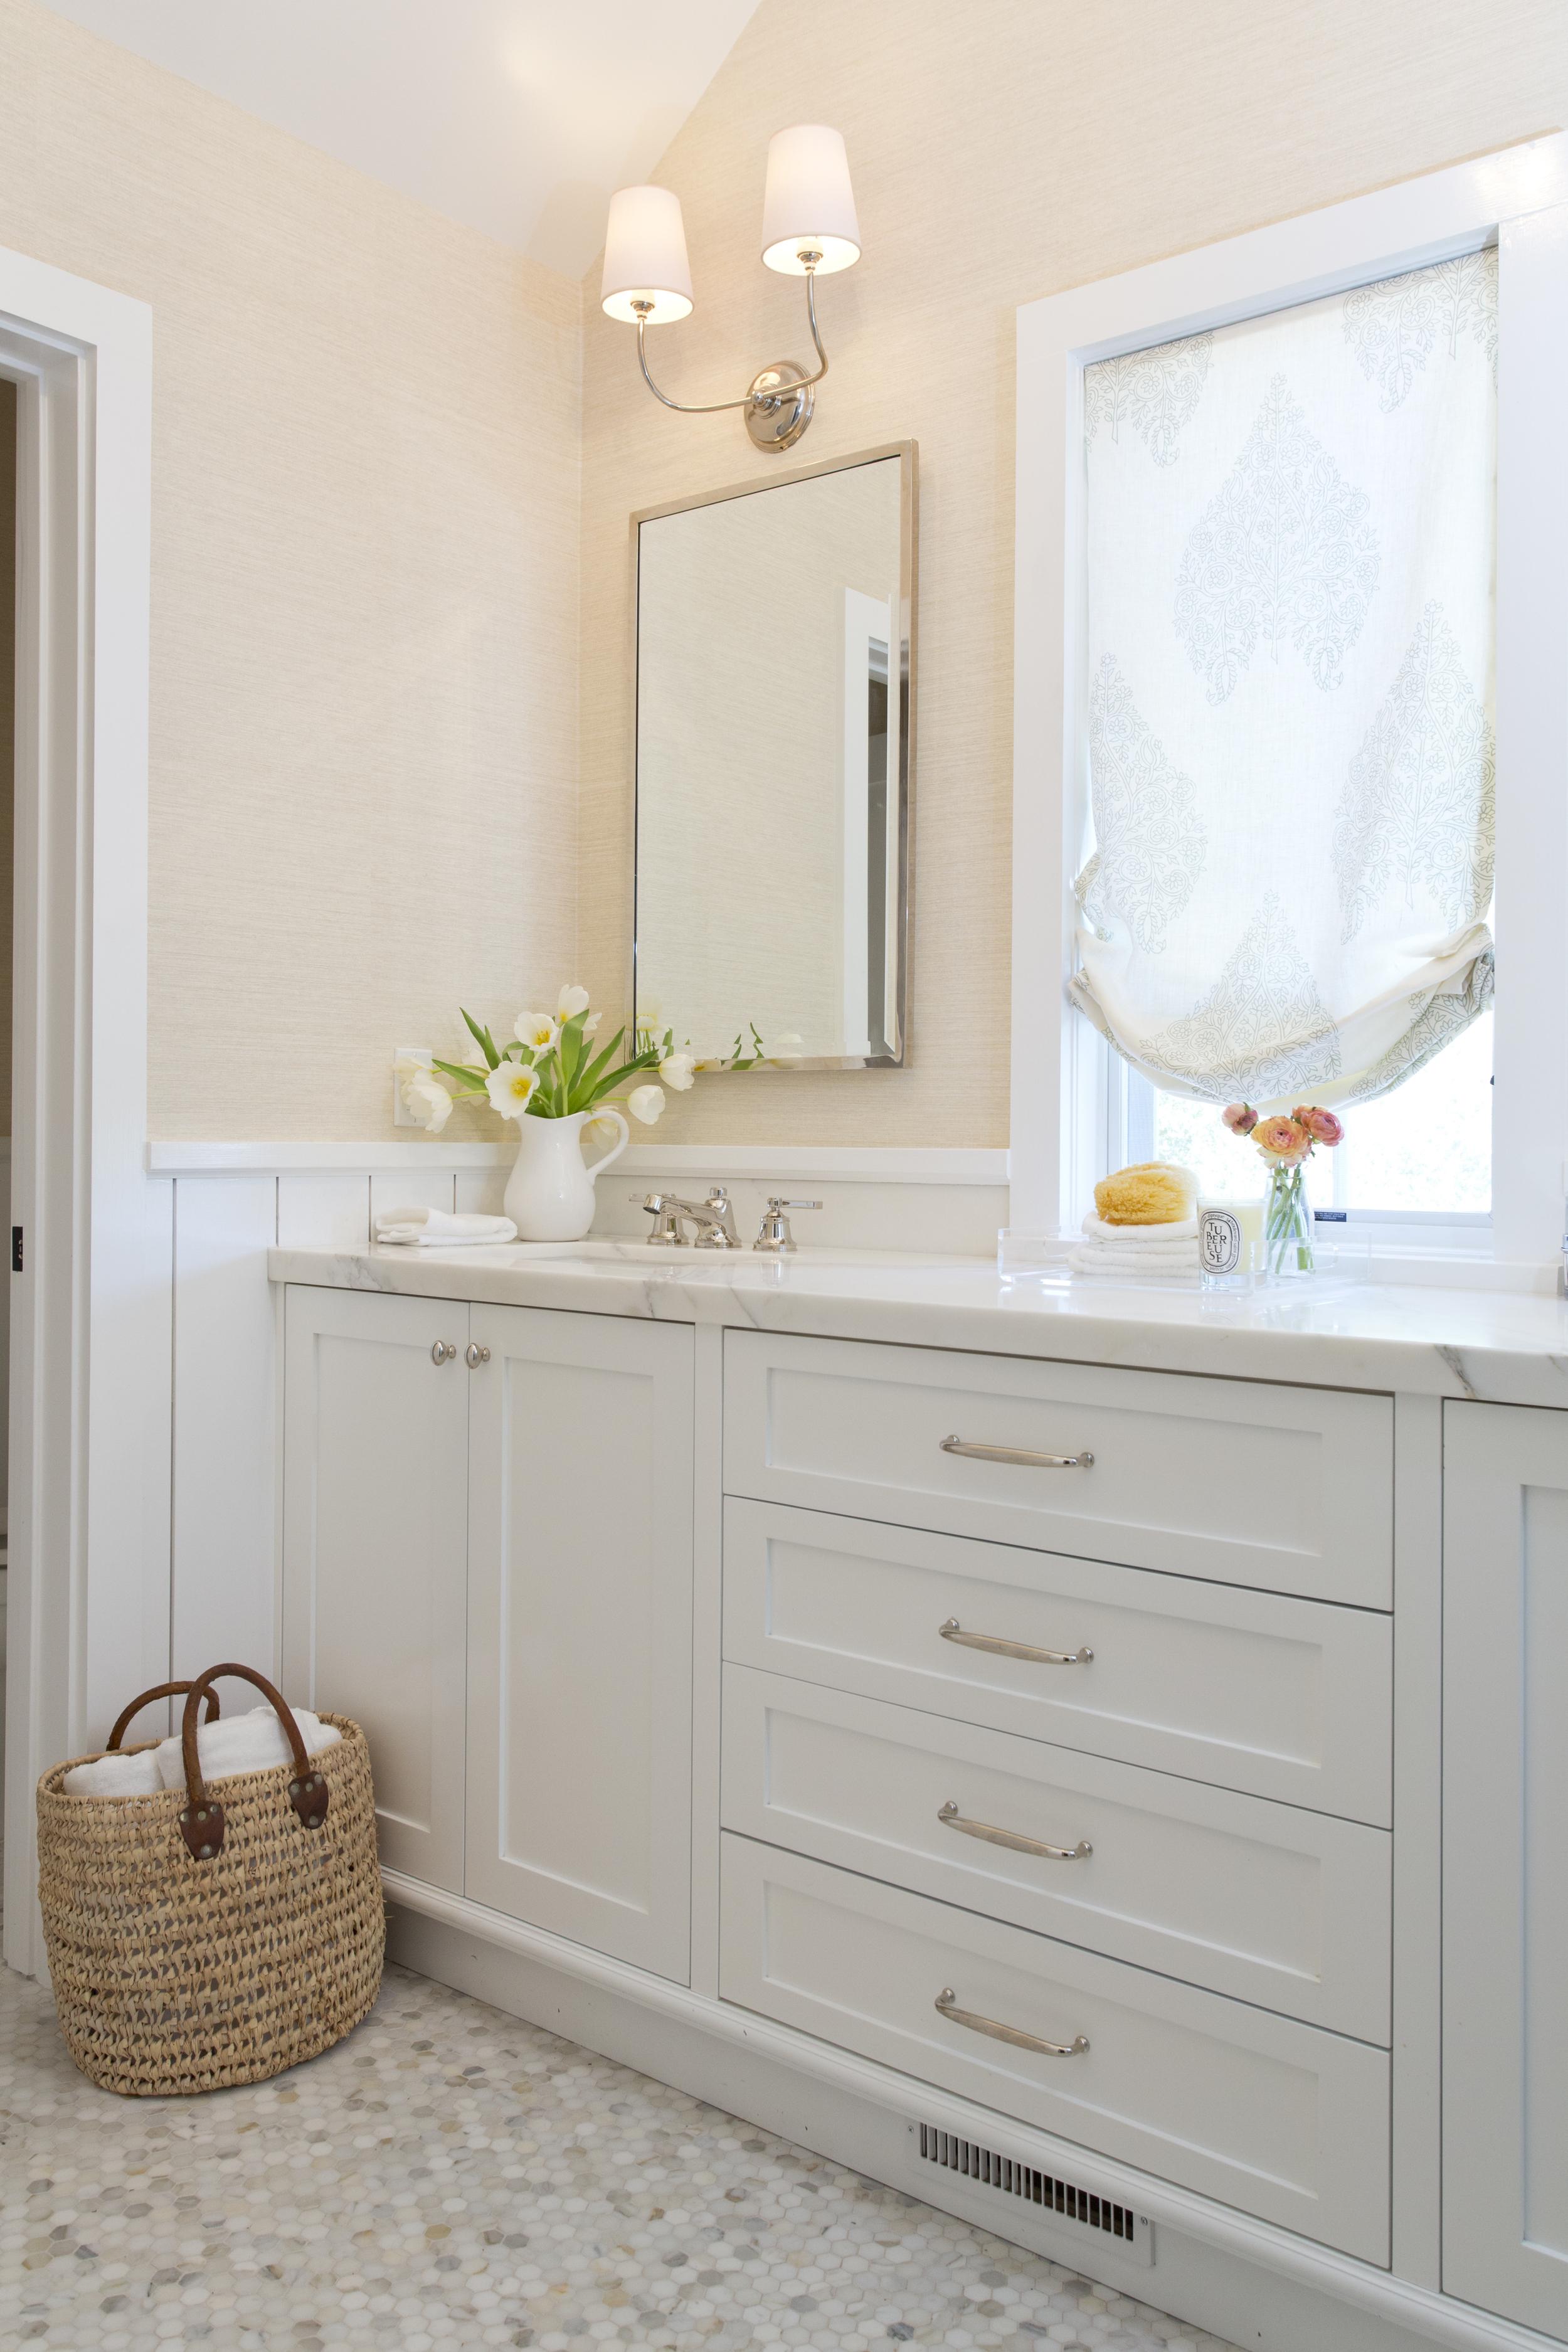 Braun + Adams Bathroom Remodel.JPG